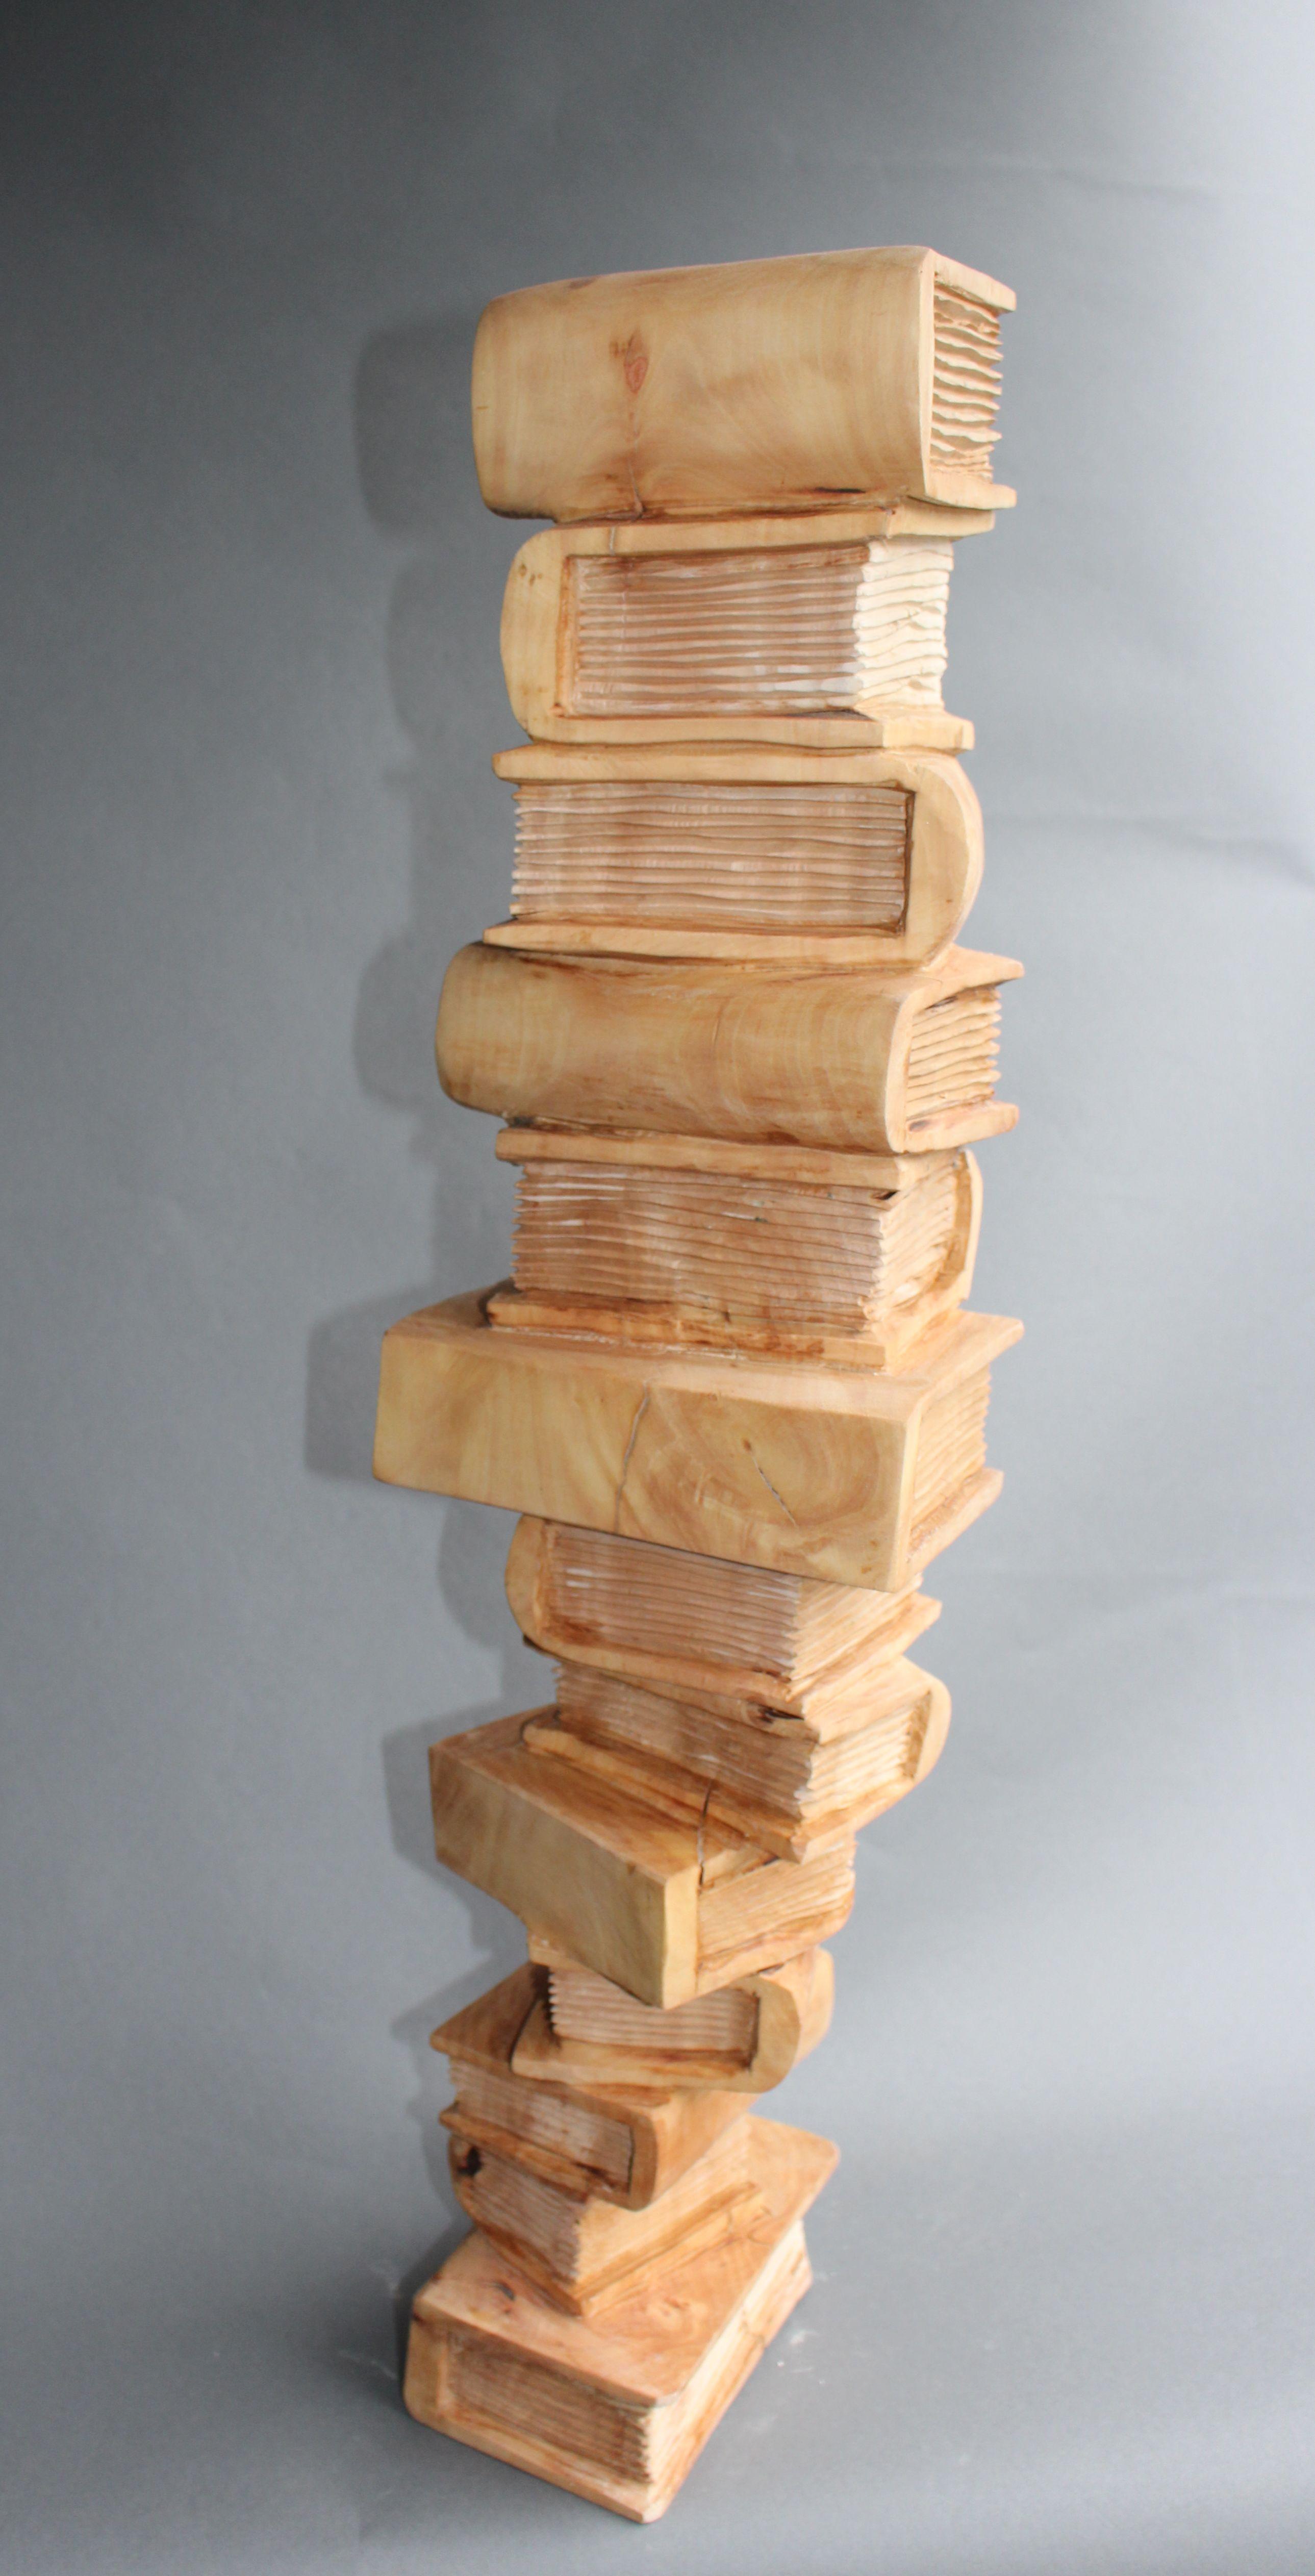 hochgestapelt-birnbaum-teilweise-geoelt15-x-12-x-75-cm-2020